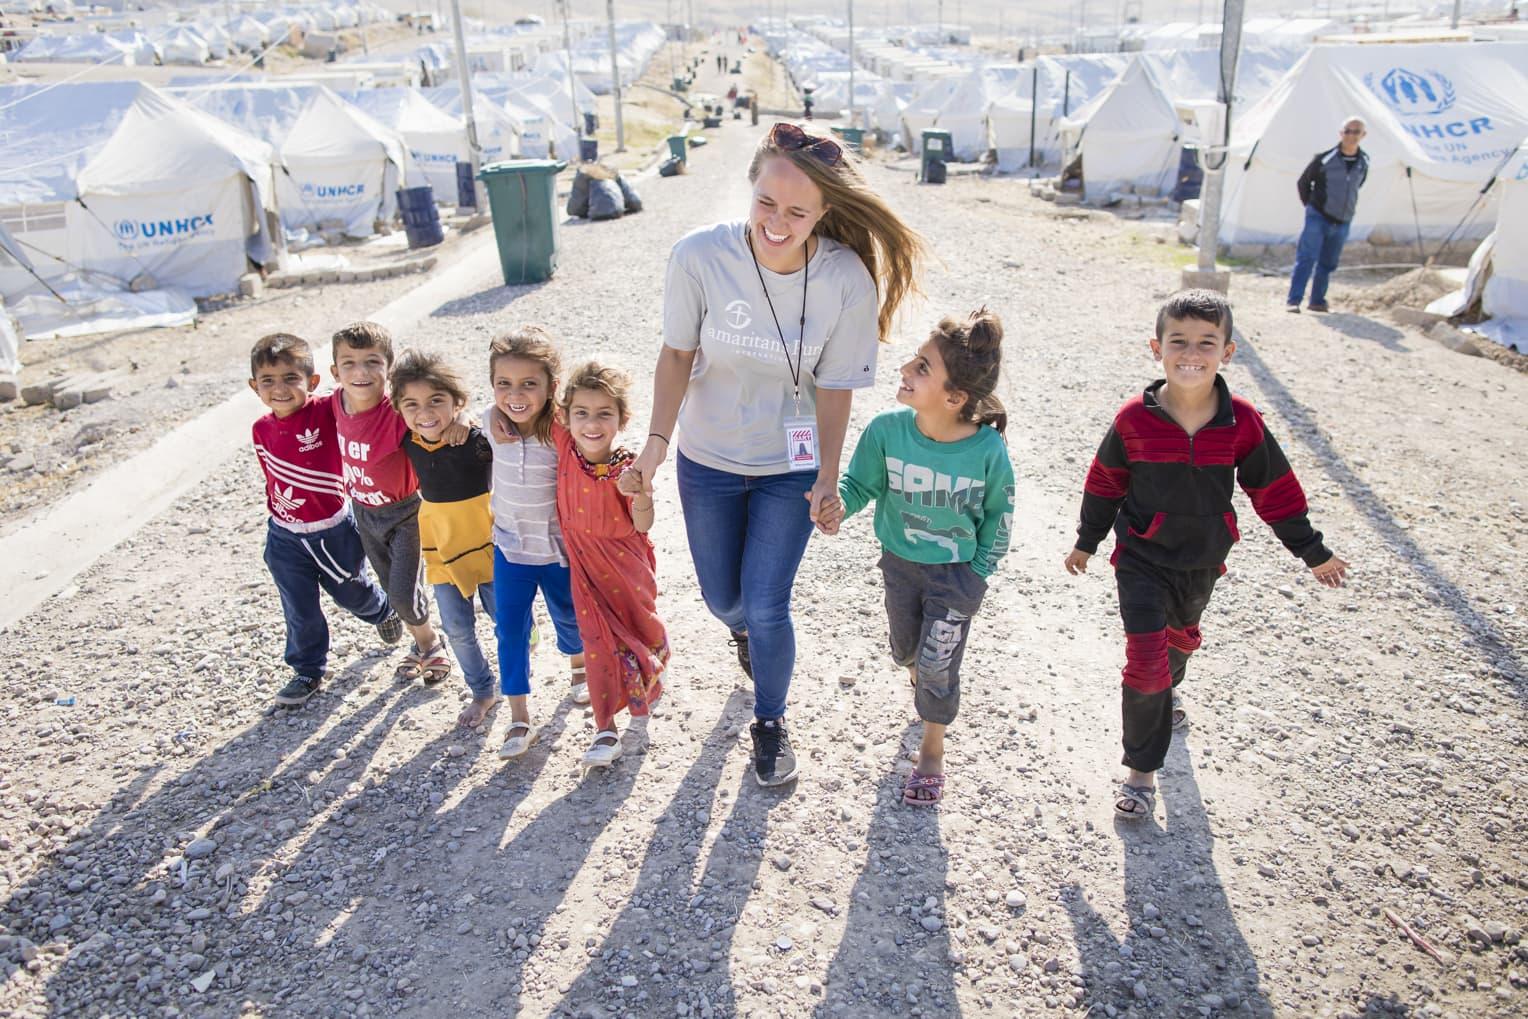 Samaritan's Purse staff member walking with refugee children.